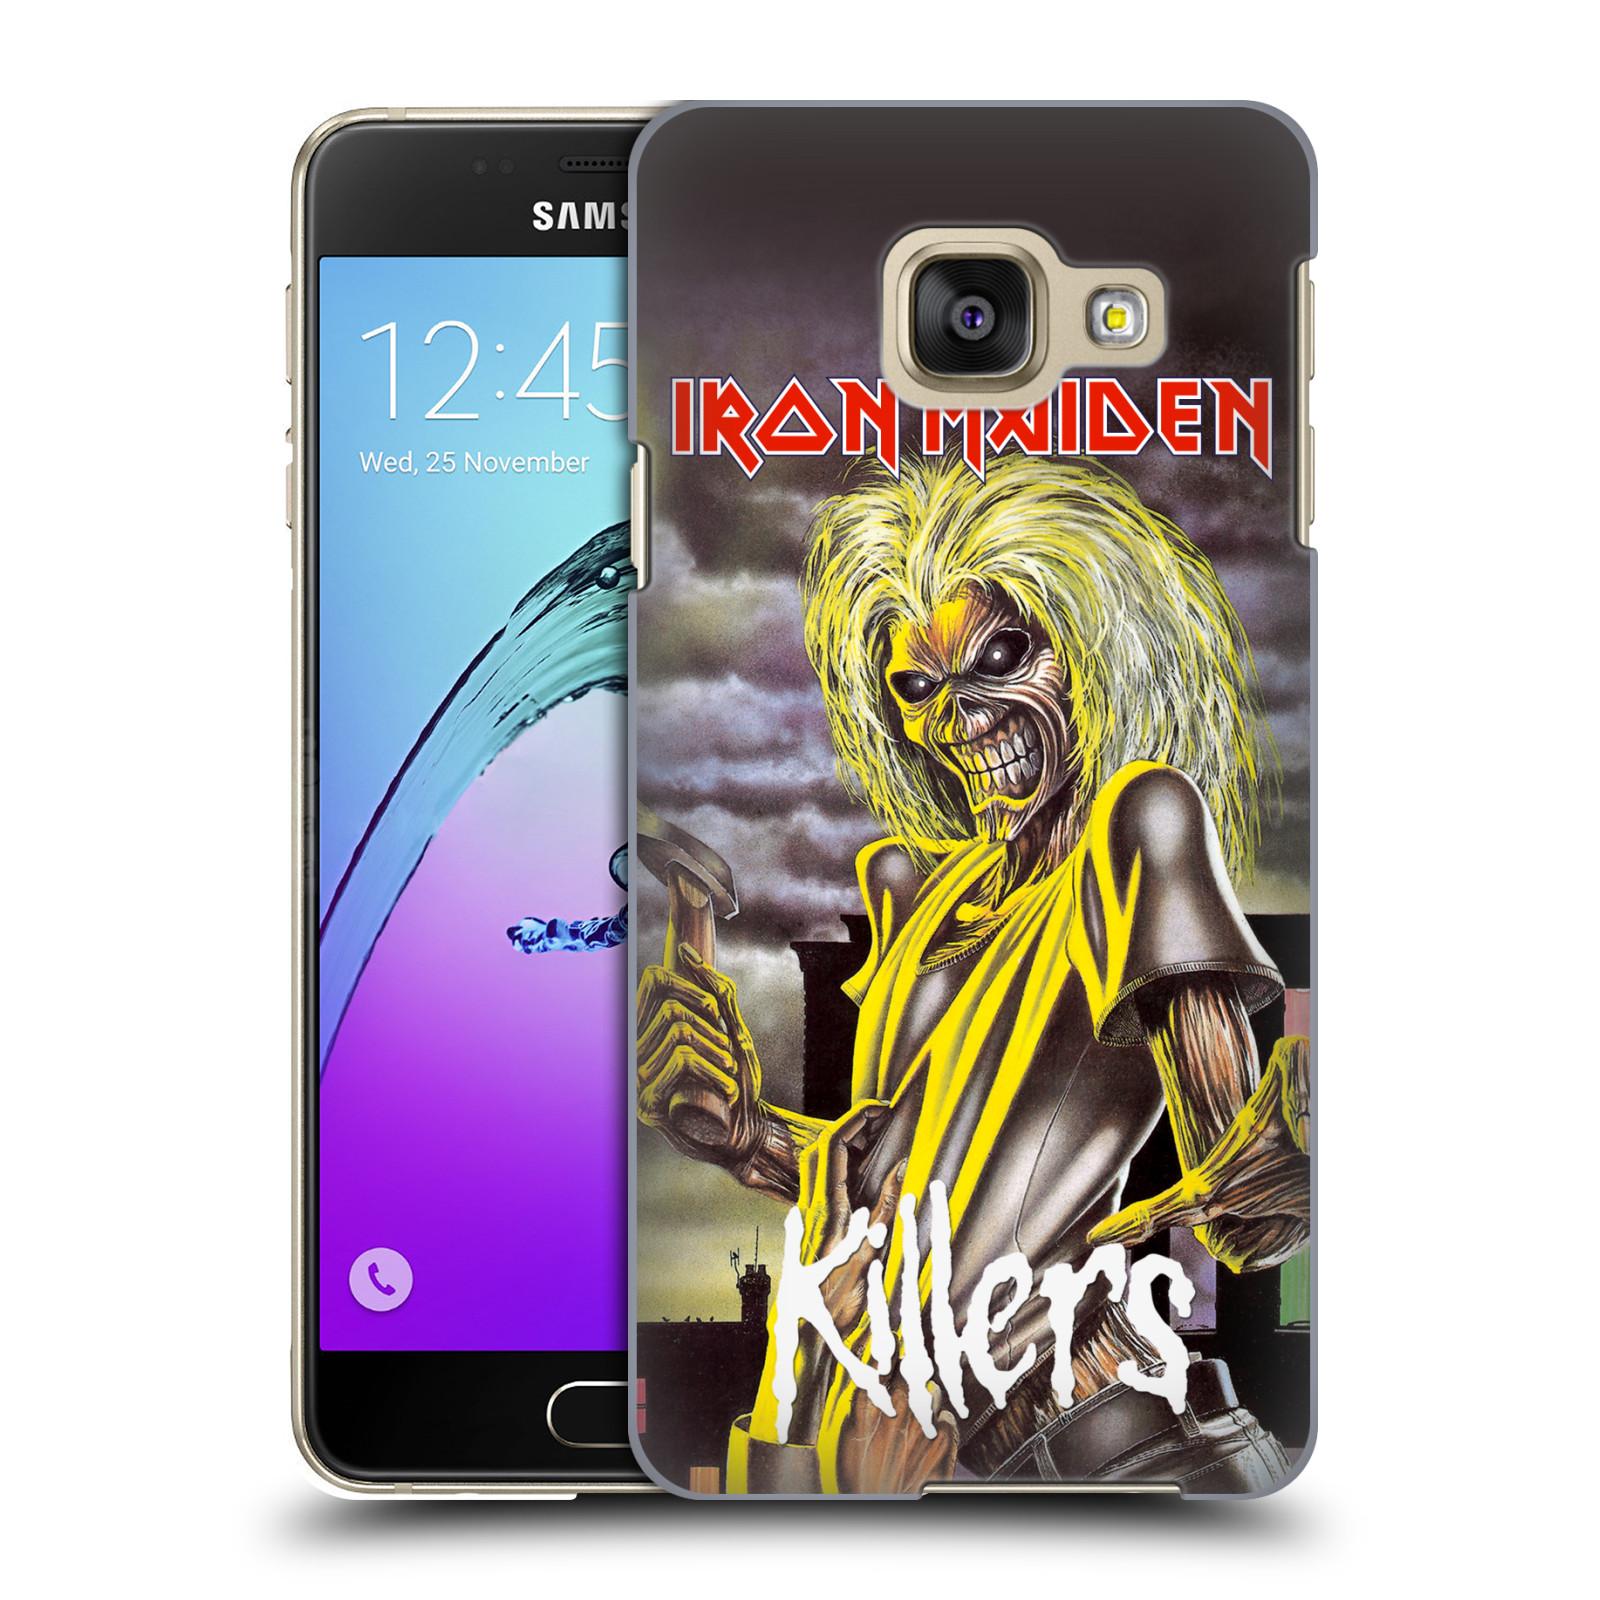 Plastové pouzdro na mobil Samsung Galaxy A3 (2016) HEAD CASE - Iron Maiden - Killers